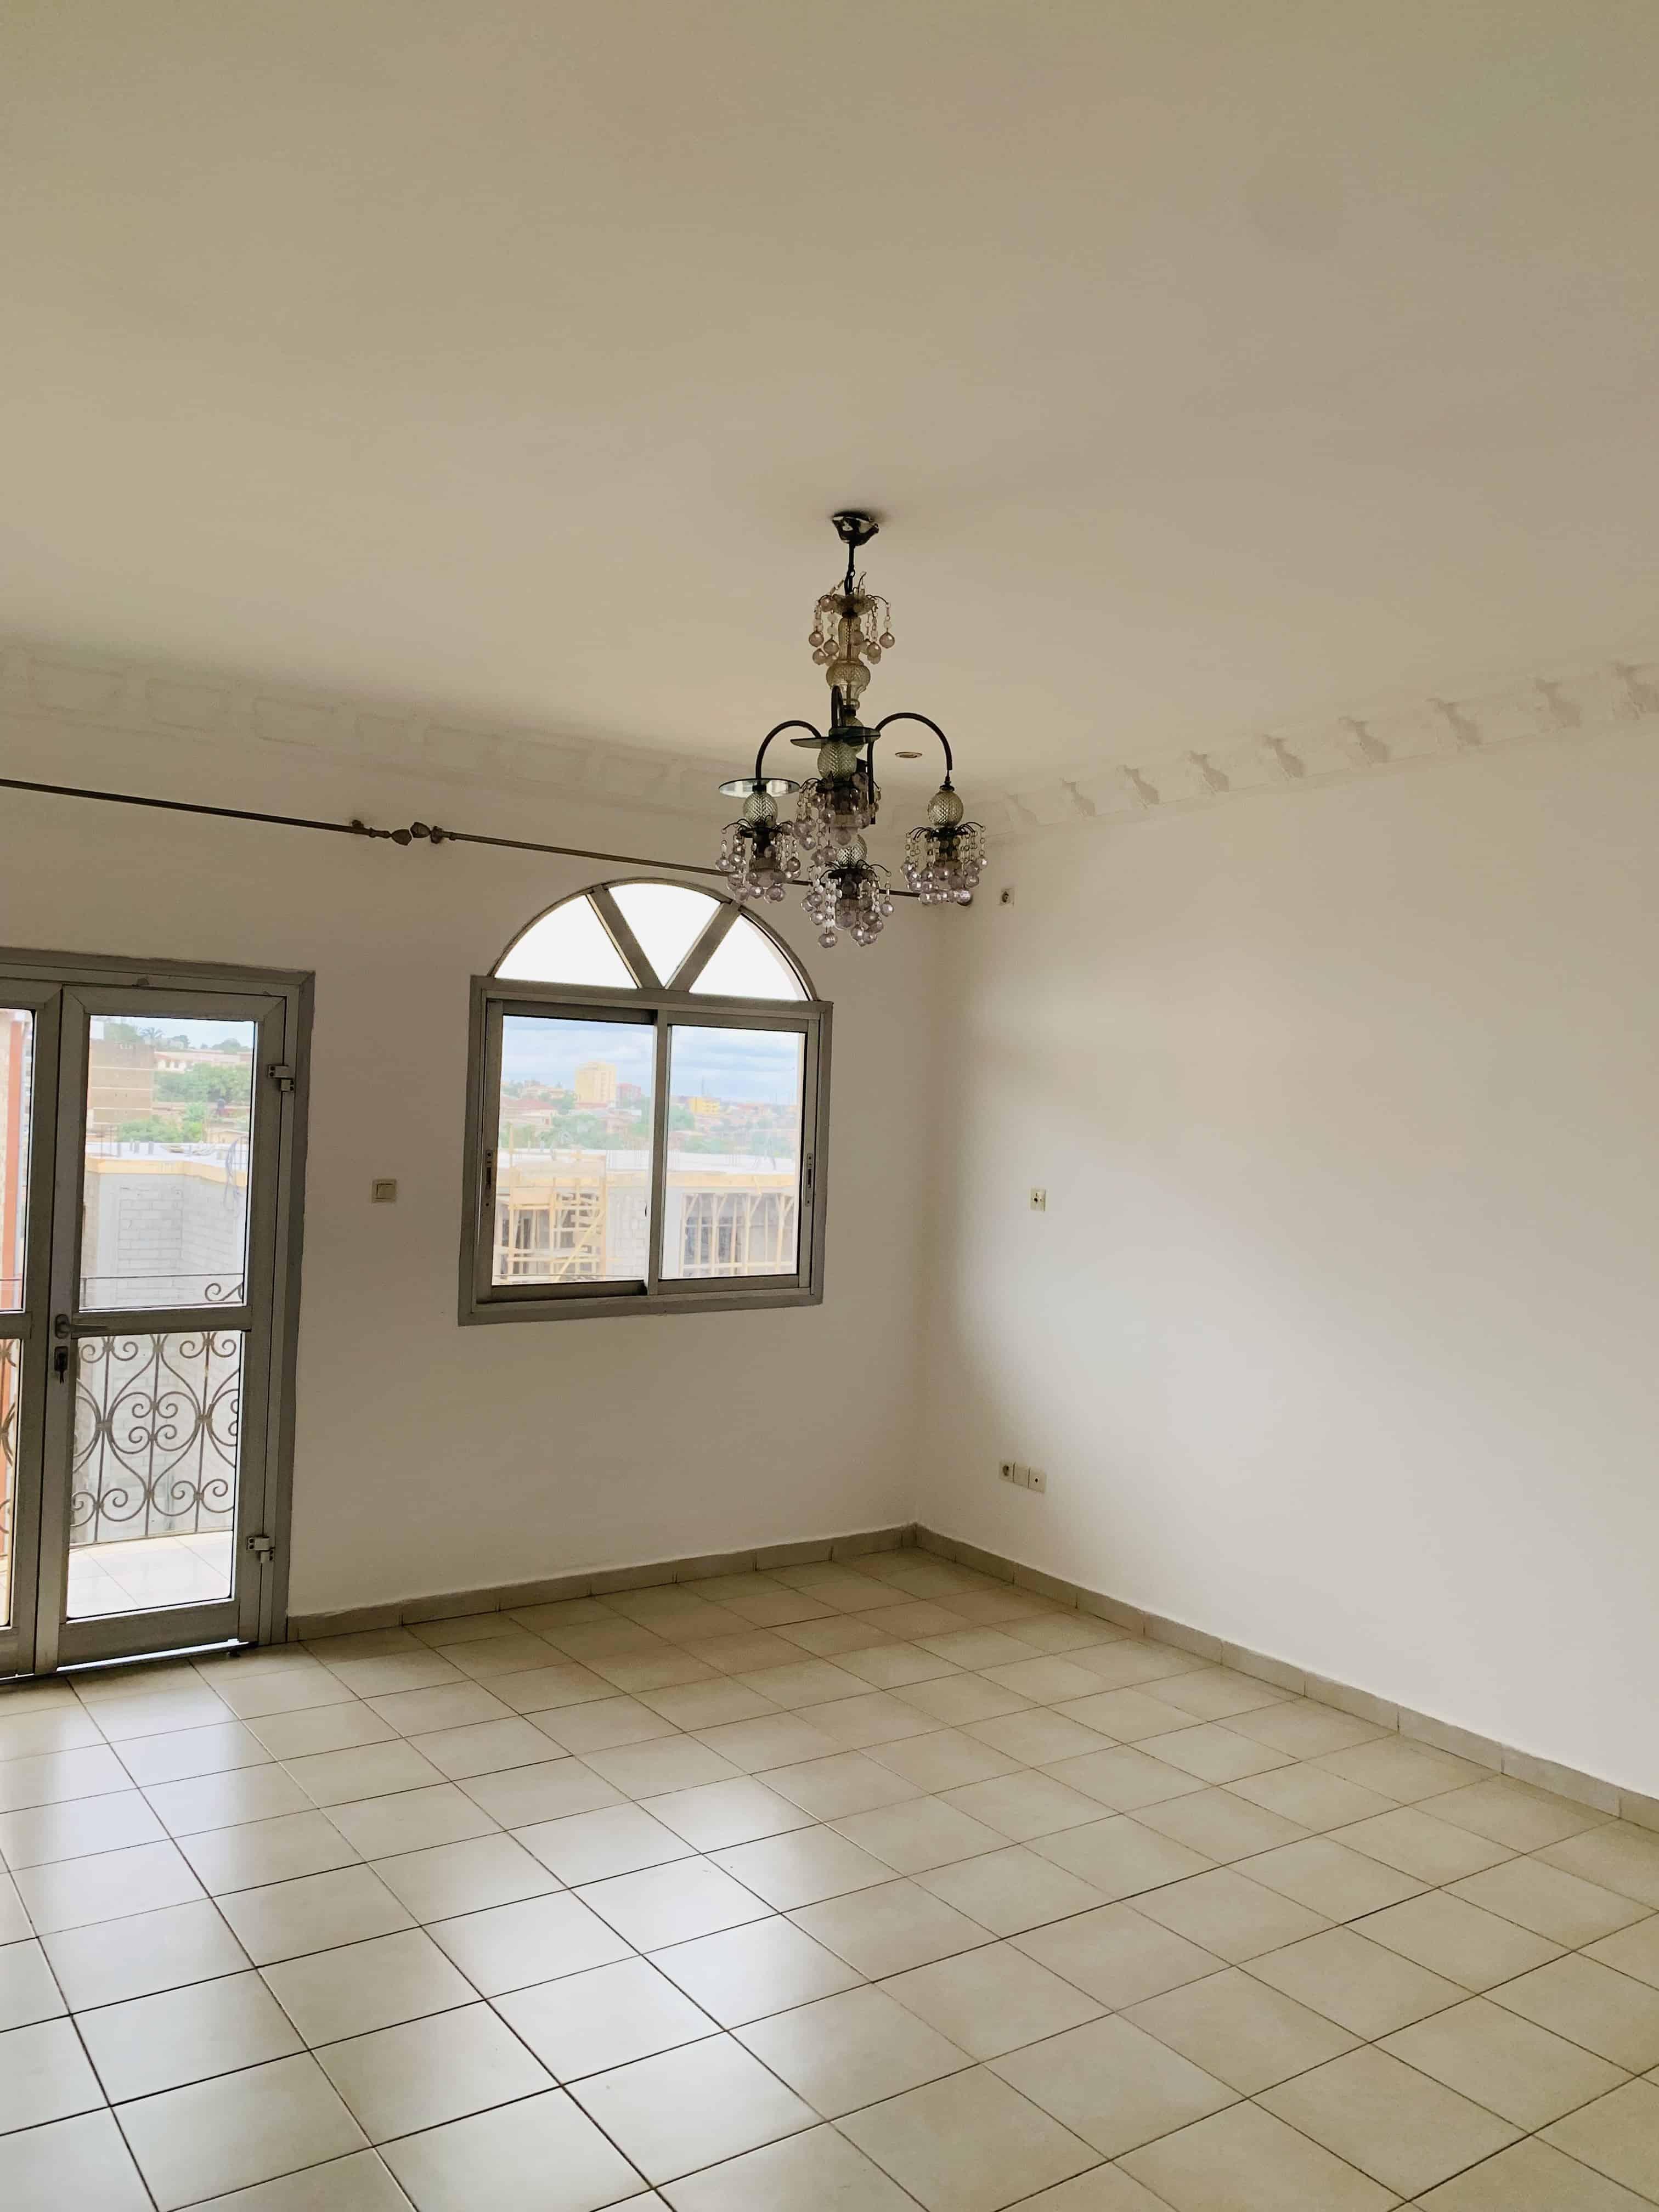 Apartment to rent - Yaoundé, Mfandena, Derrière stade omnisports - 1 living room(s), 2 bedroom(s), 1 bathroom(s) - 200 000 FCFA / month